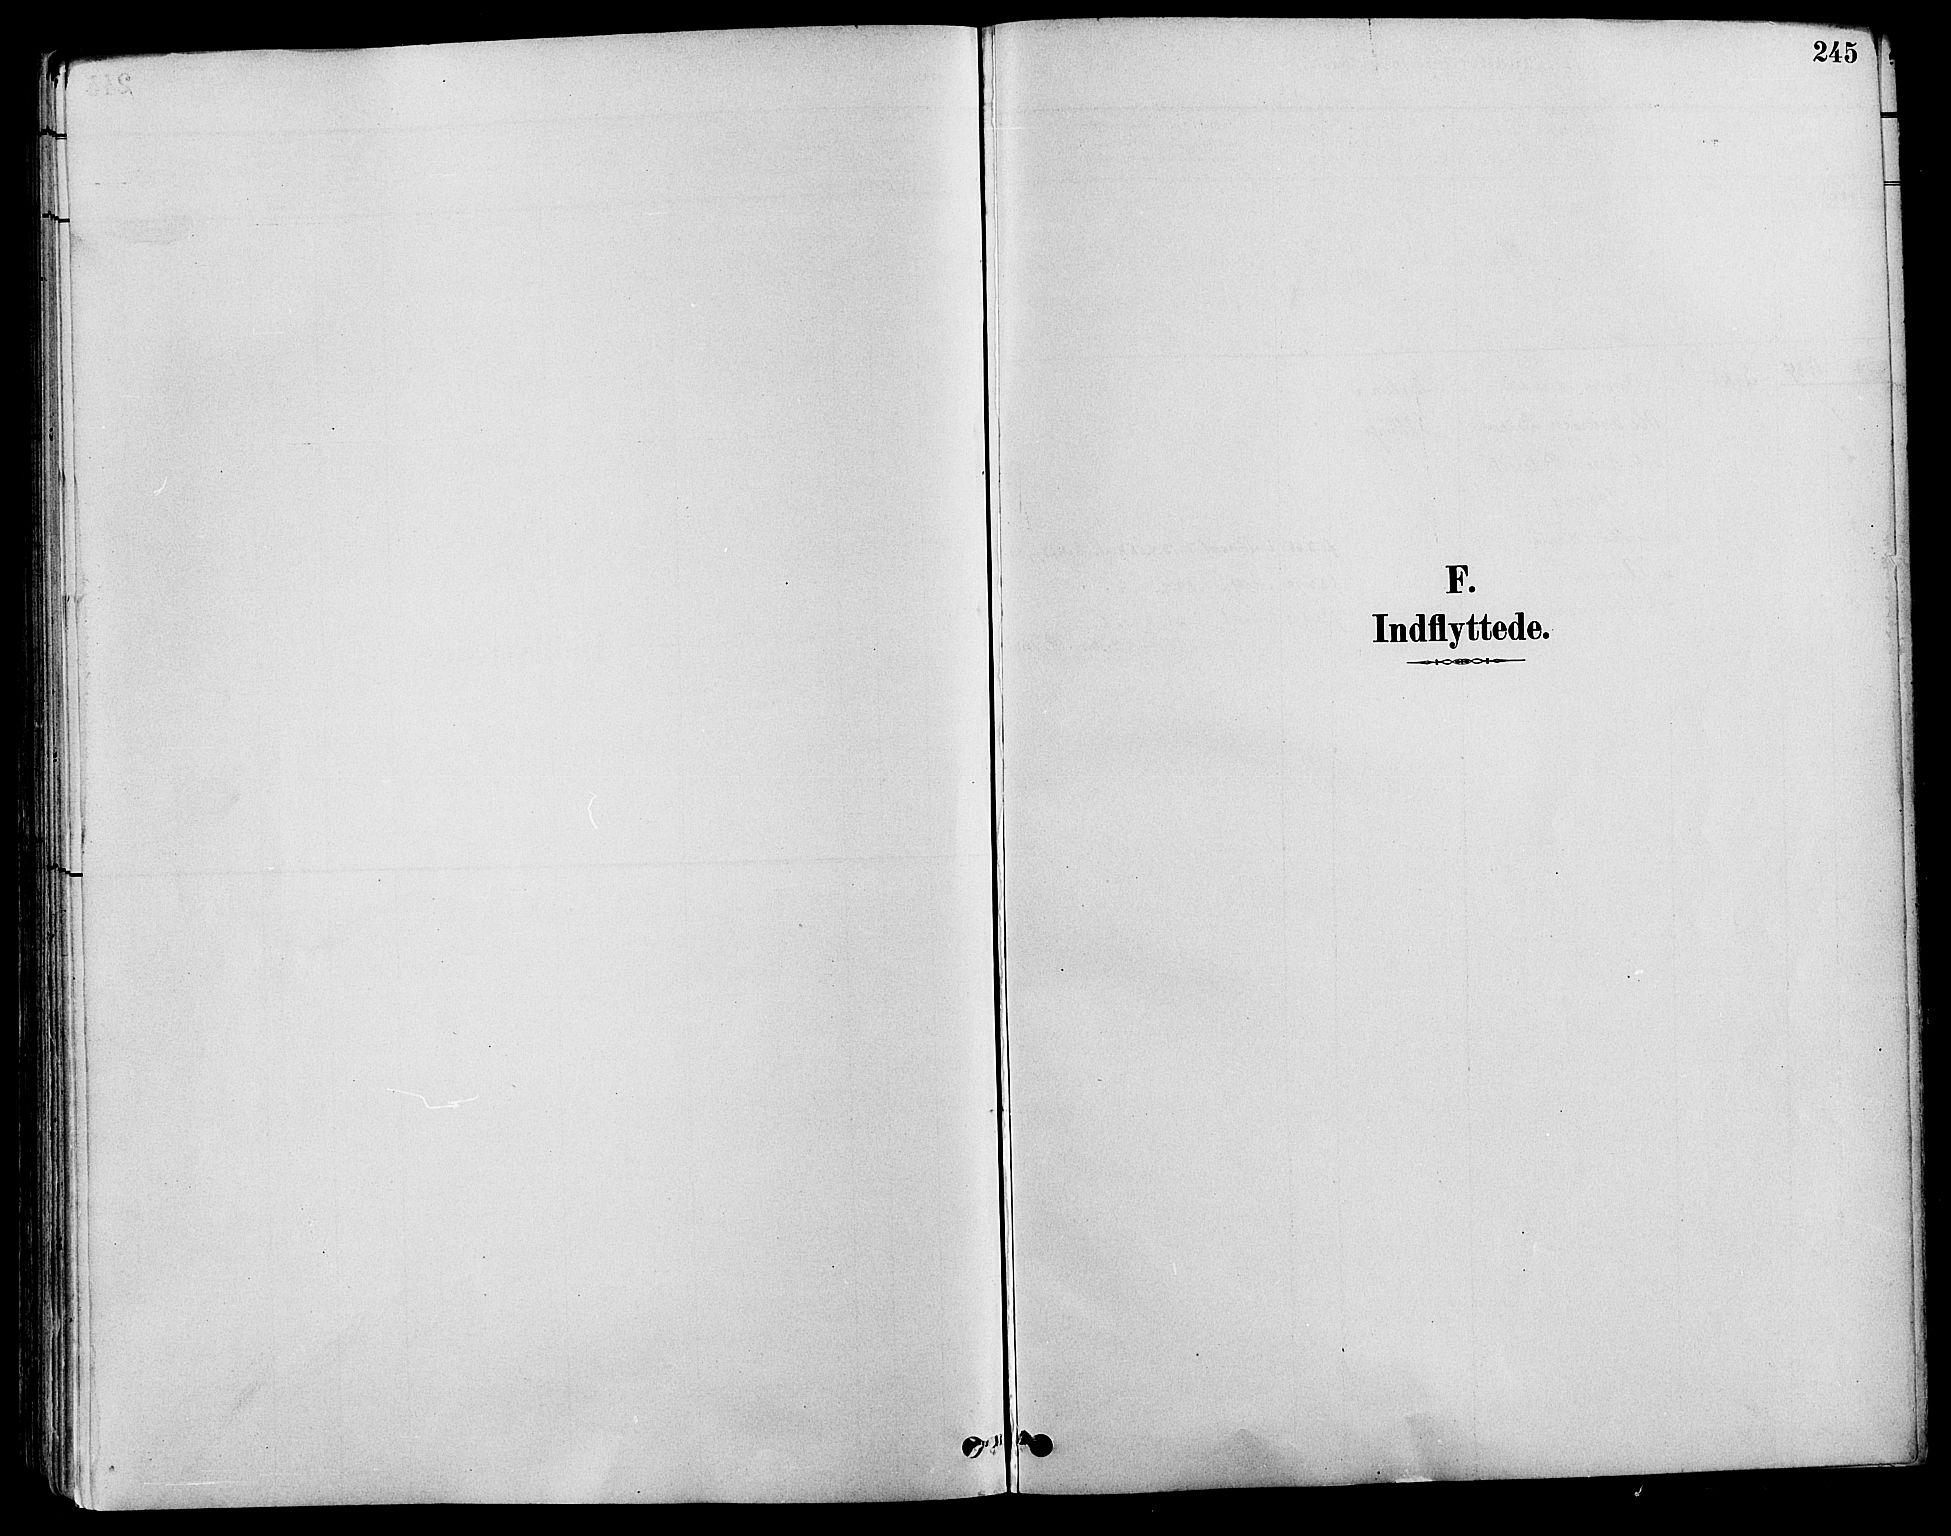 SAH, Nord-Fron prestekontor, Klokkerbok nr. 4, 1884-1914, s. 245